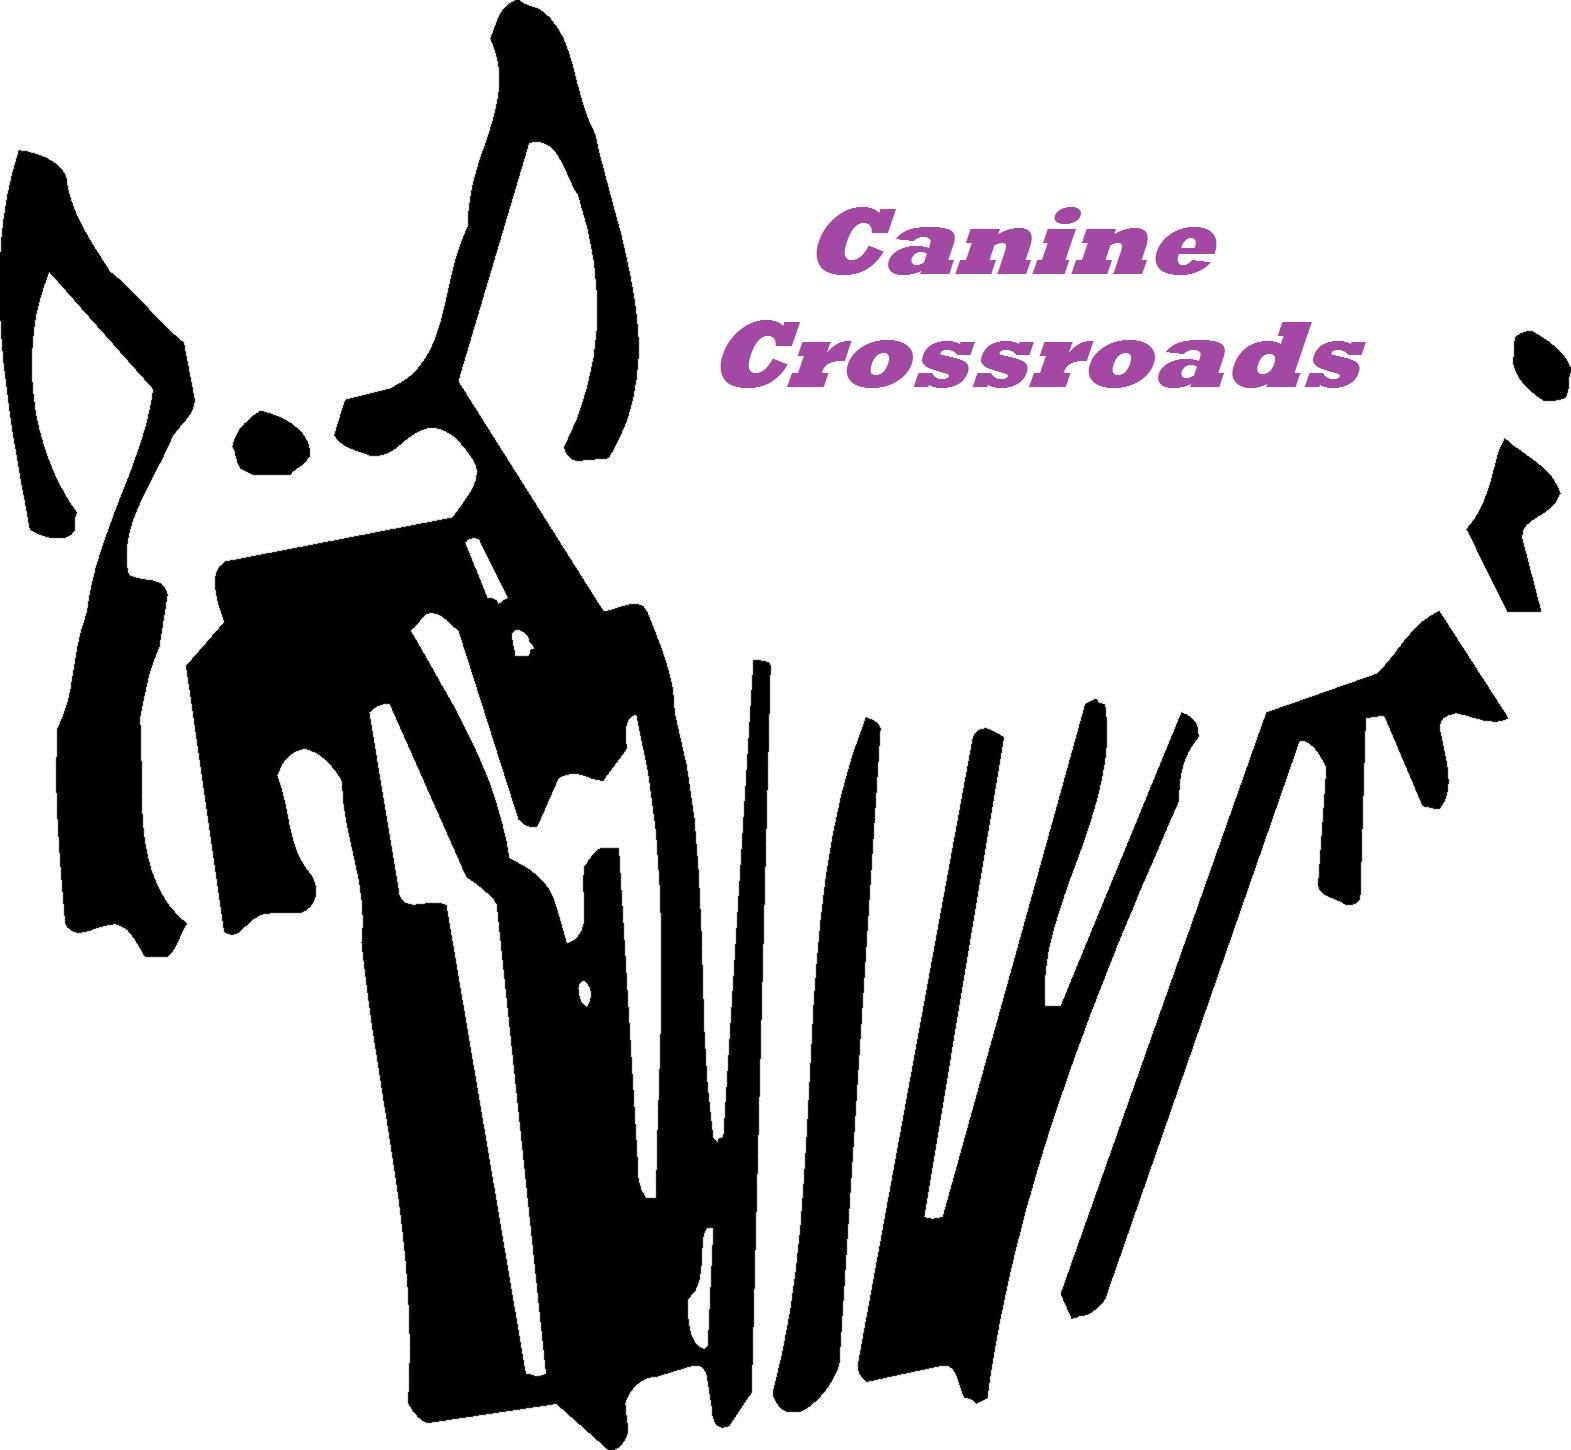 Canine Crossroads